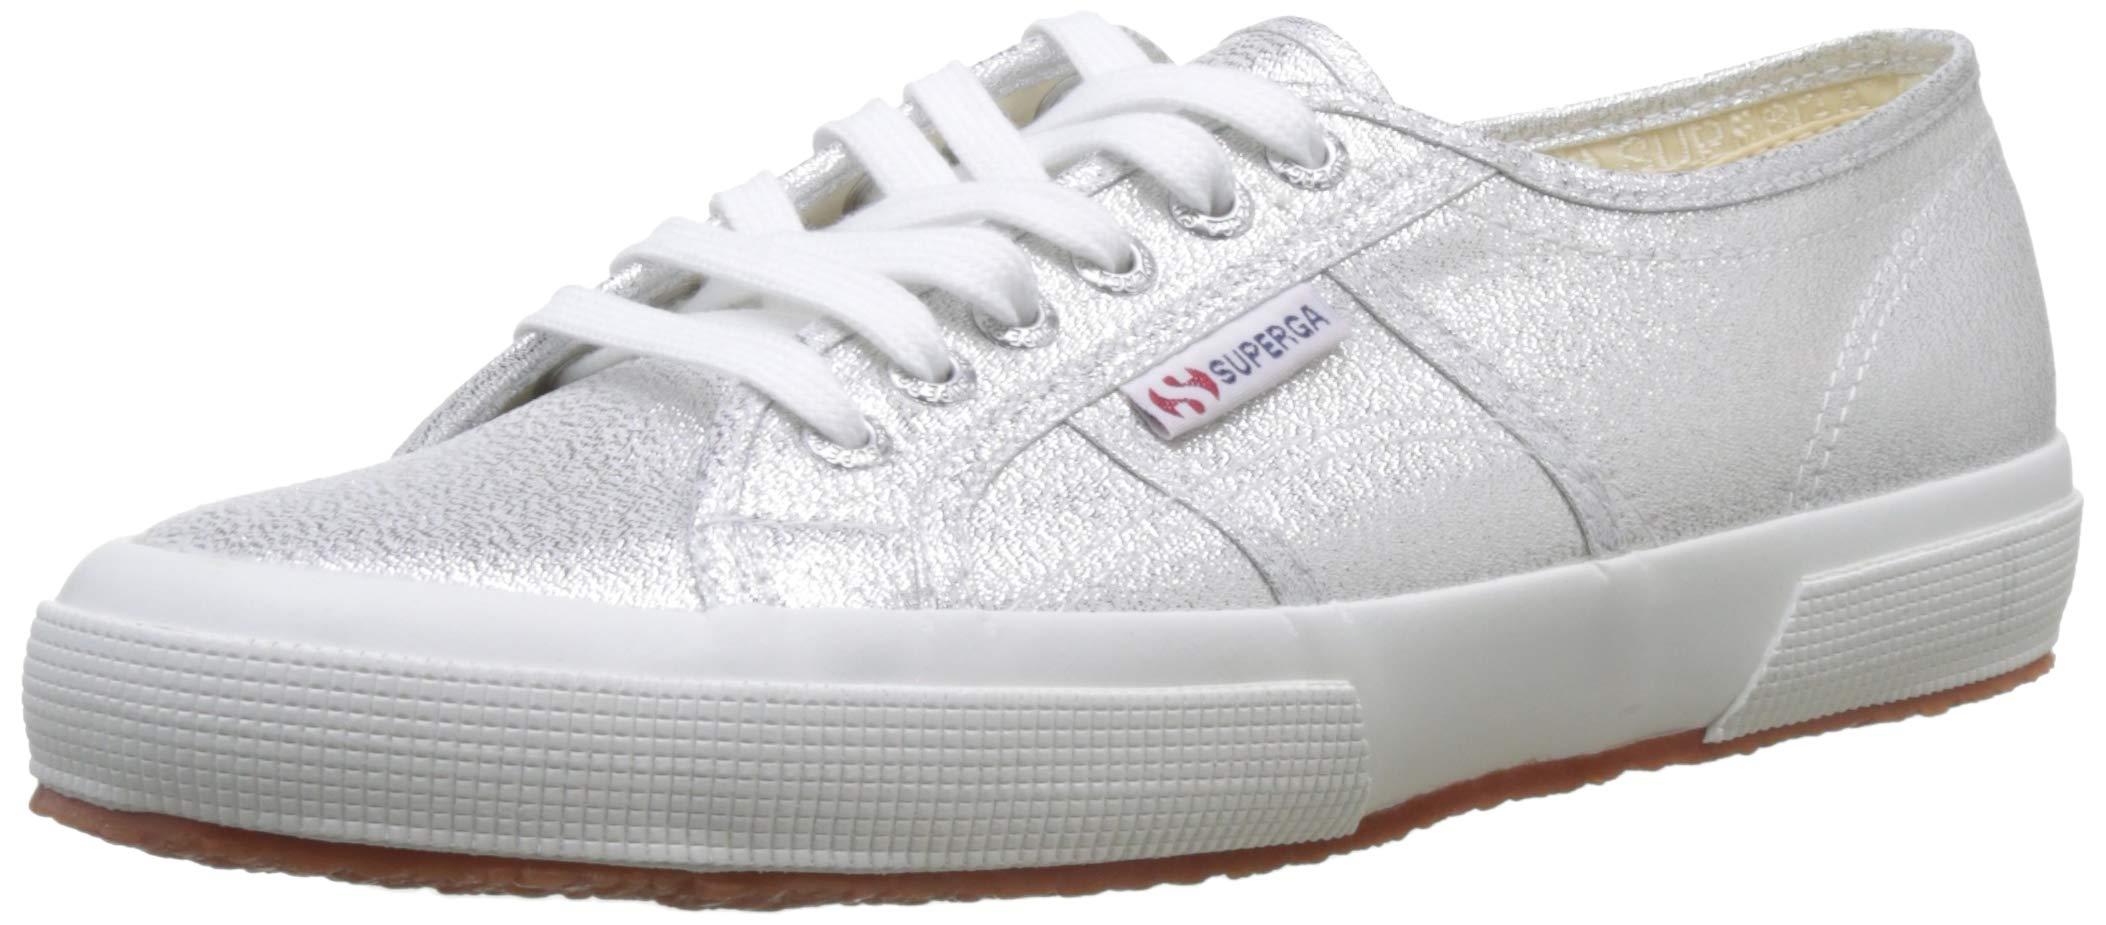 Women's 2750-lamew Low-Top Sneakers